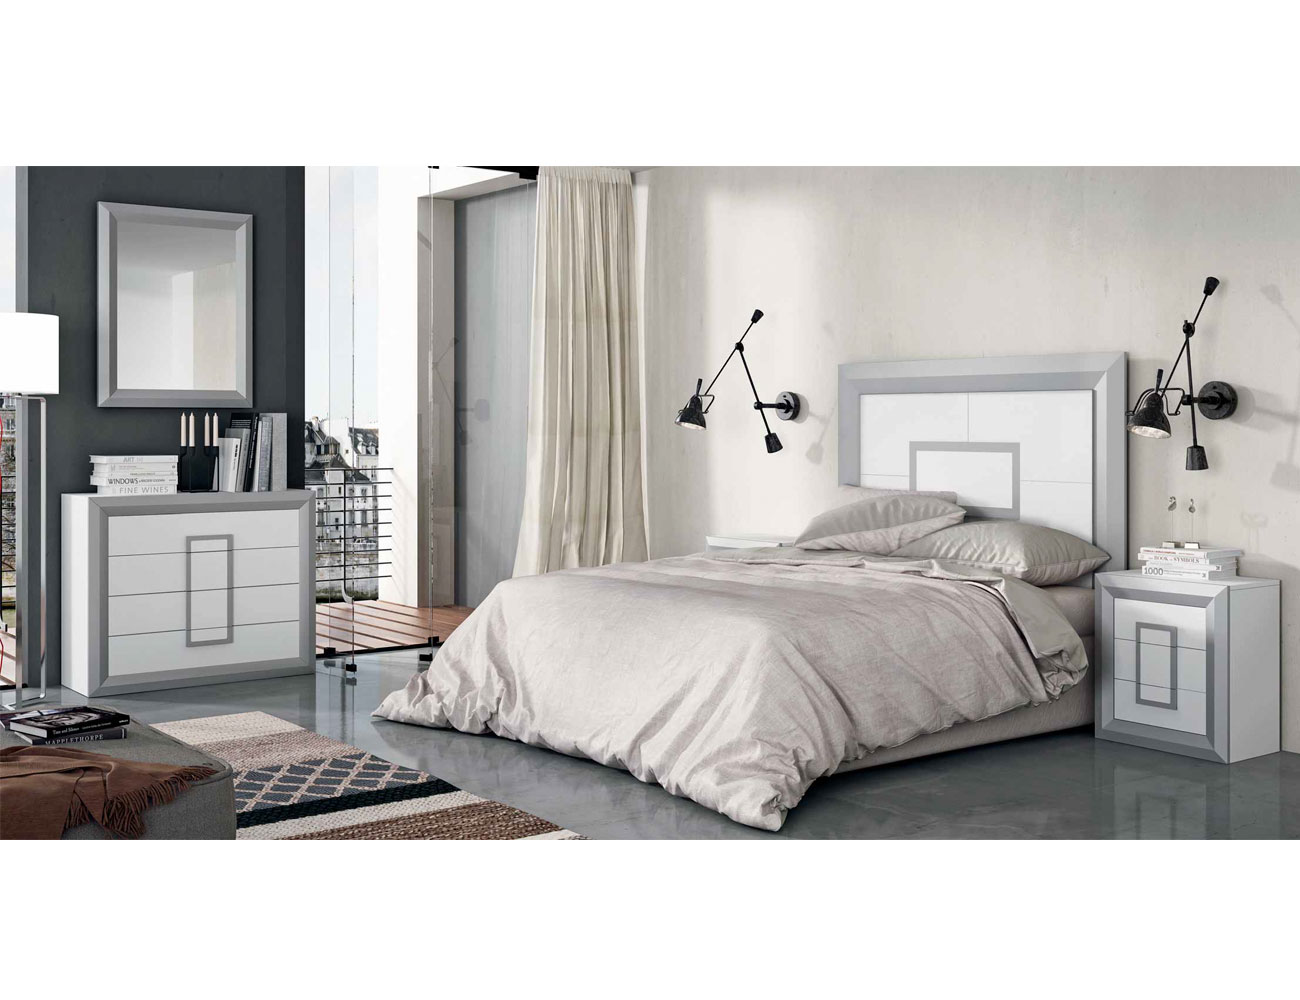 Dormitorio matrimonio cabecero plafon blanco plata